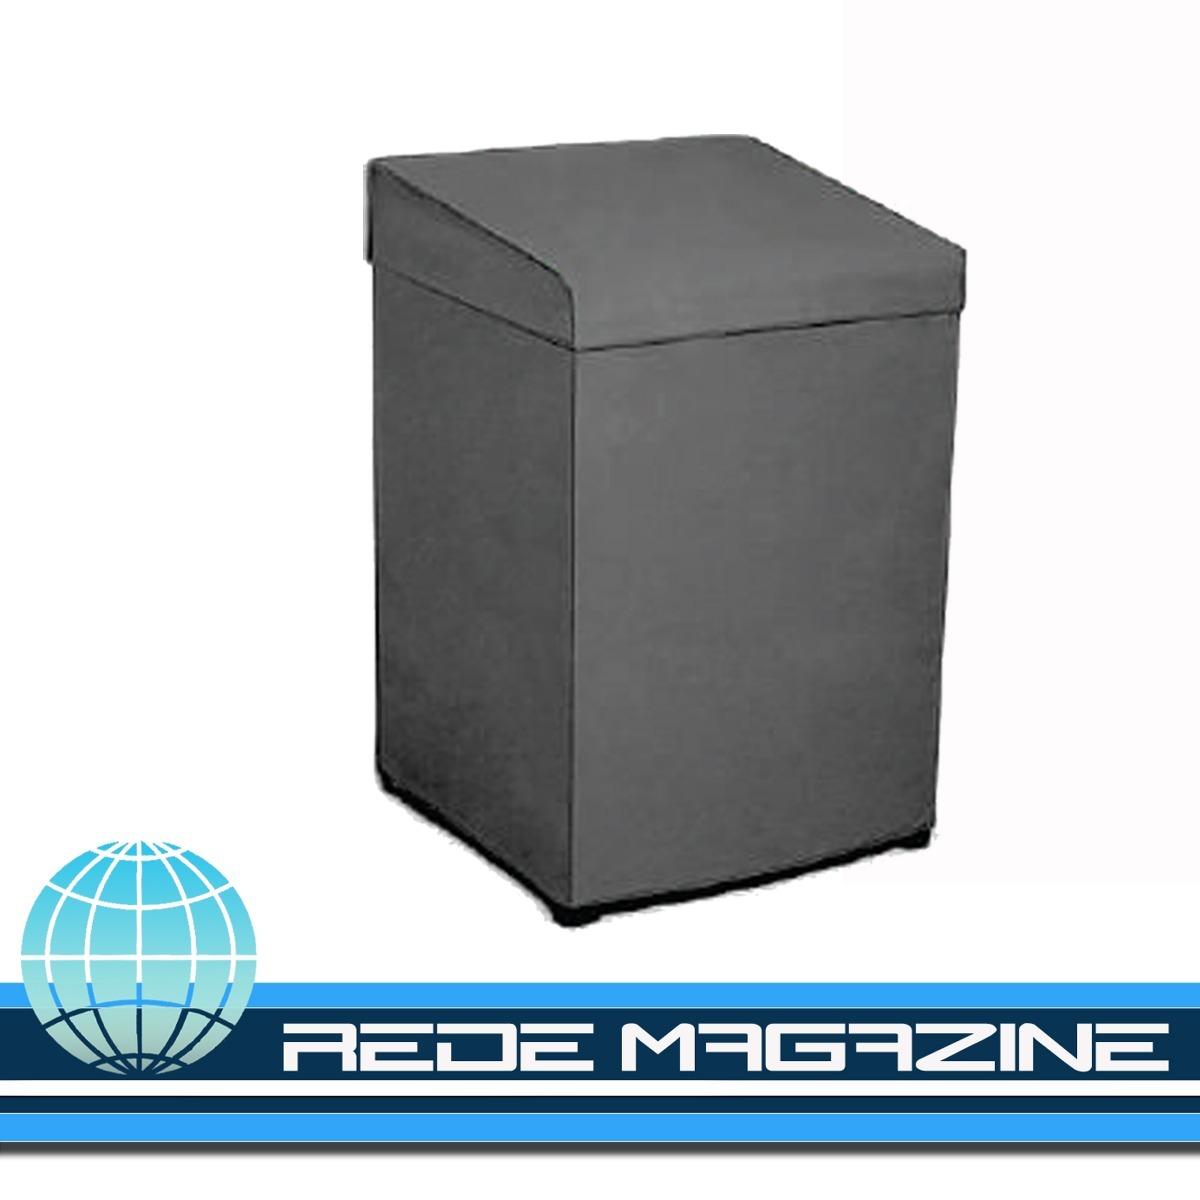 06ada4472 capa máquina lavar electrolux eletrolux brastemp 7 8 9 10kg. Carregando  zoom.